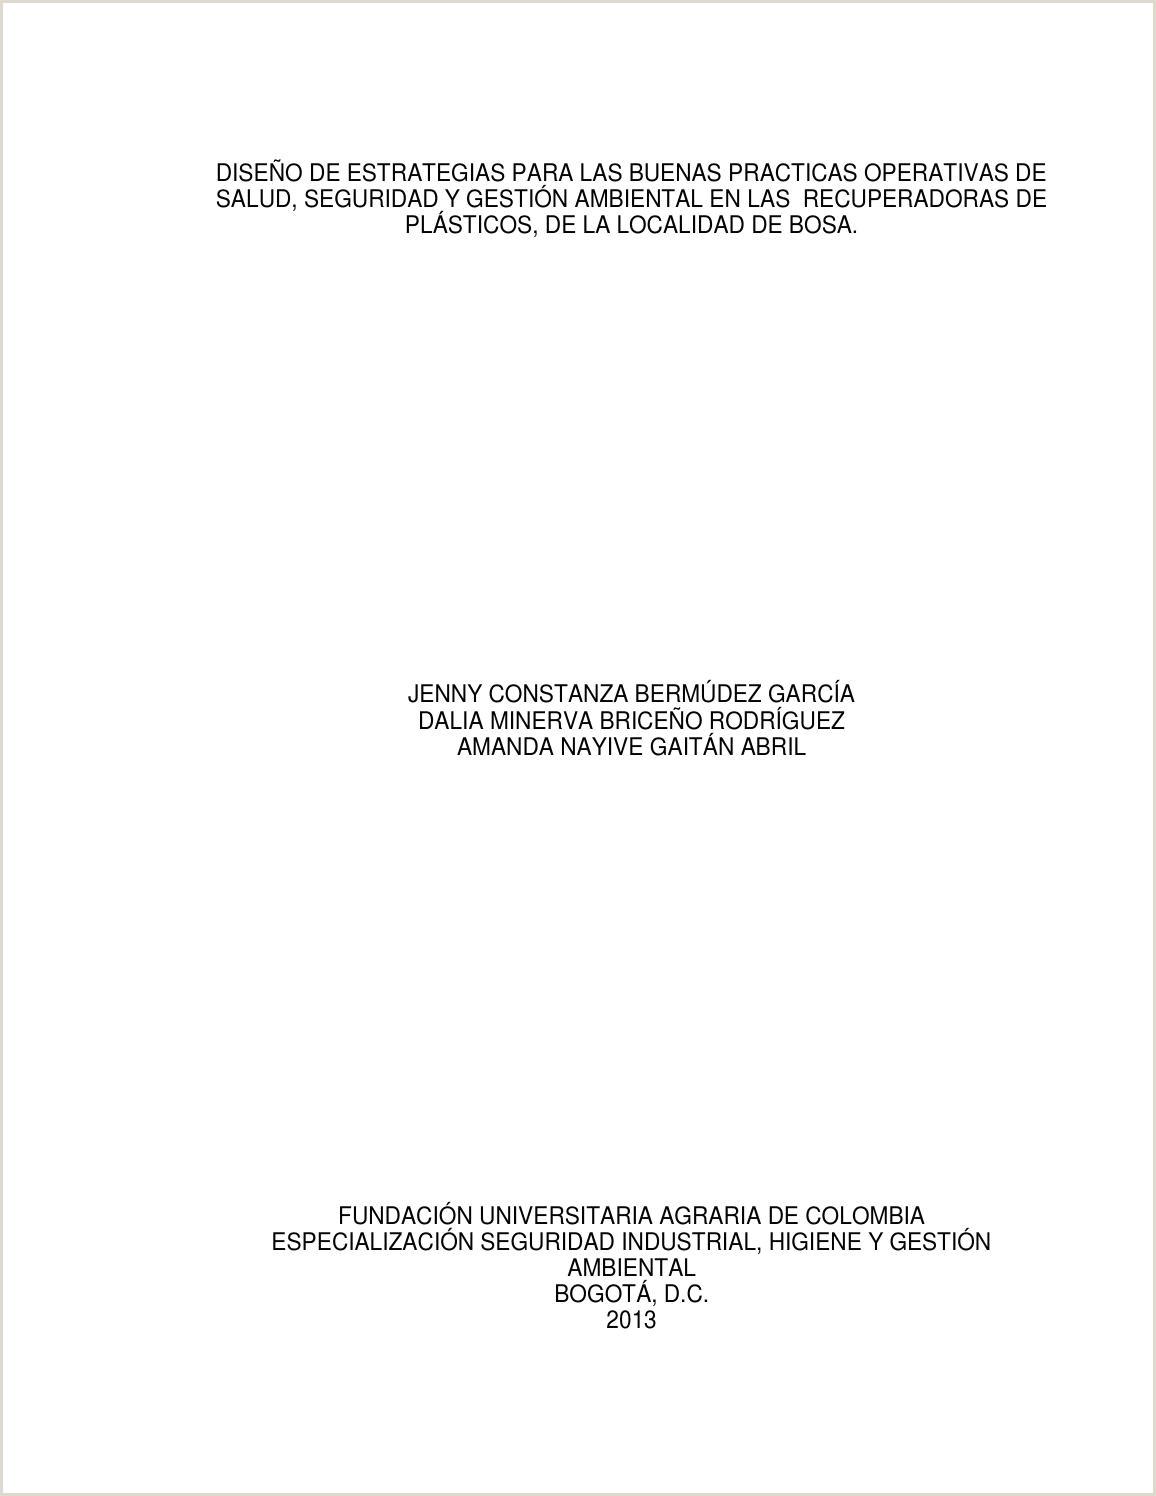 Formato Hoja De Vida forma Minerva Tesis0492shg by Maosabo issuu